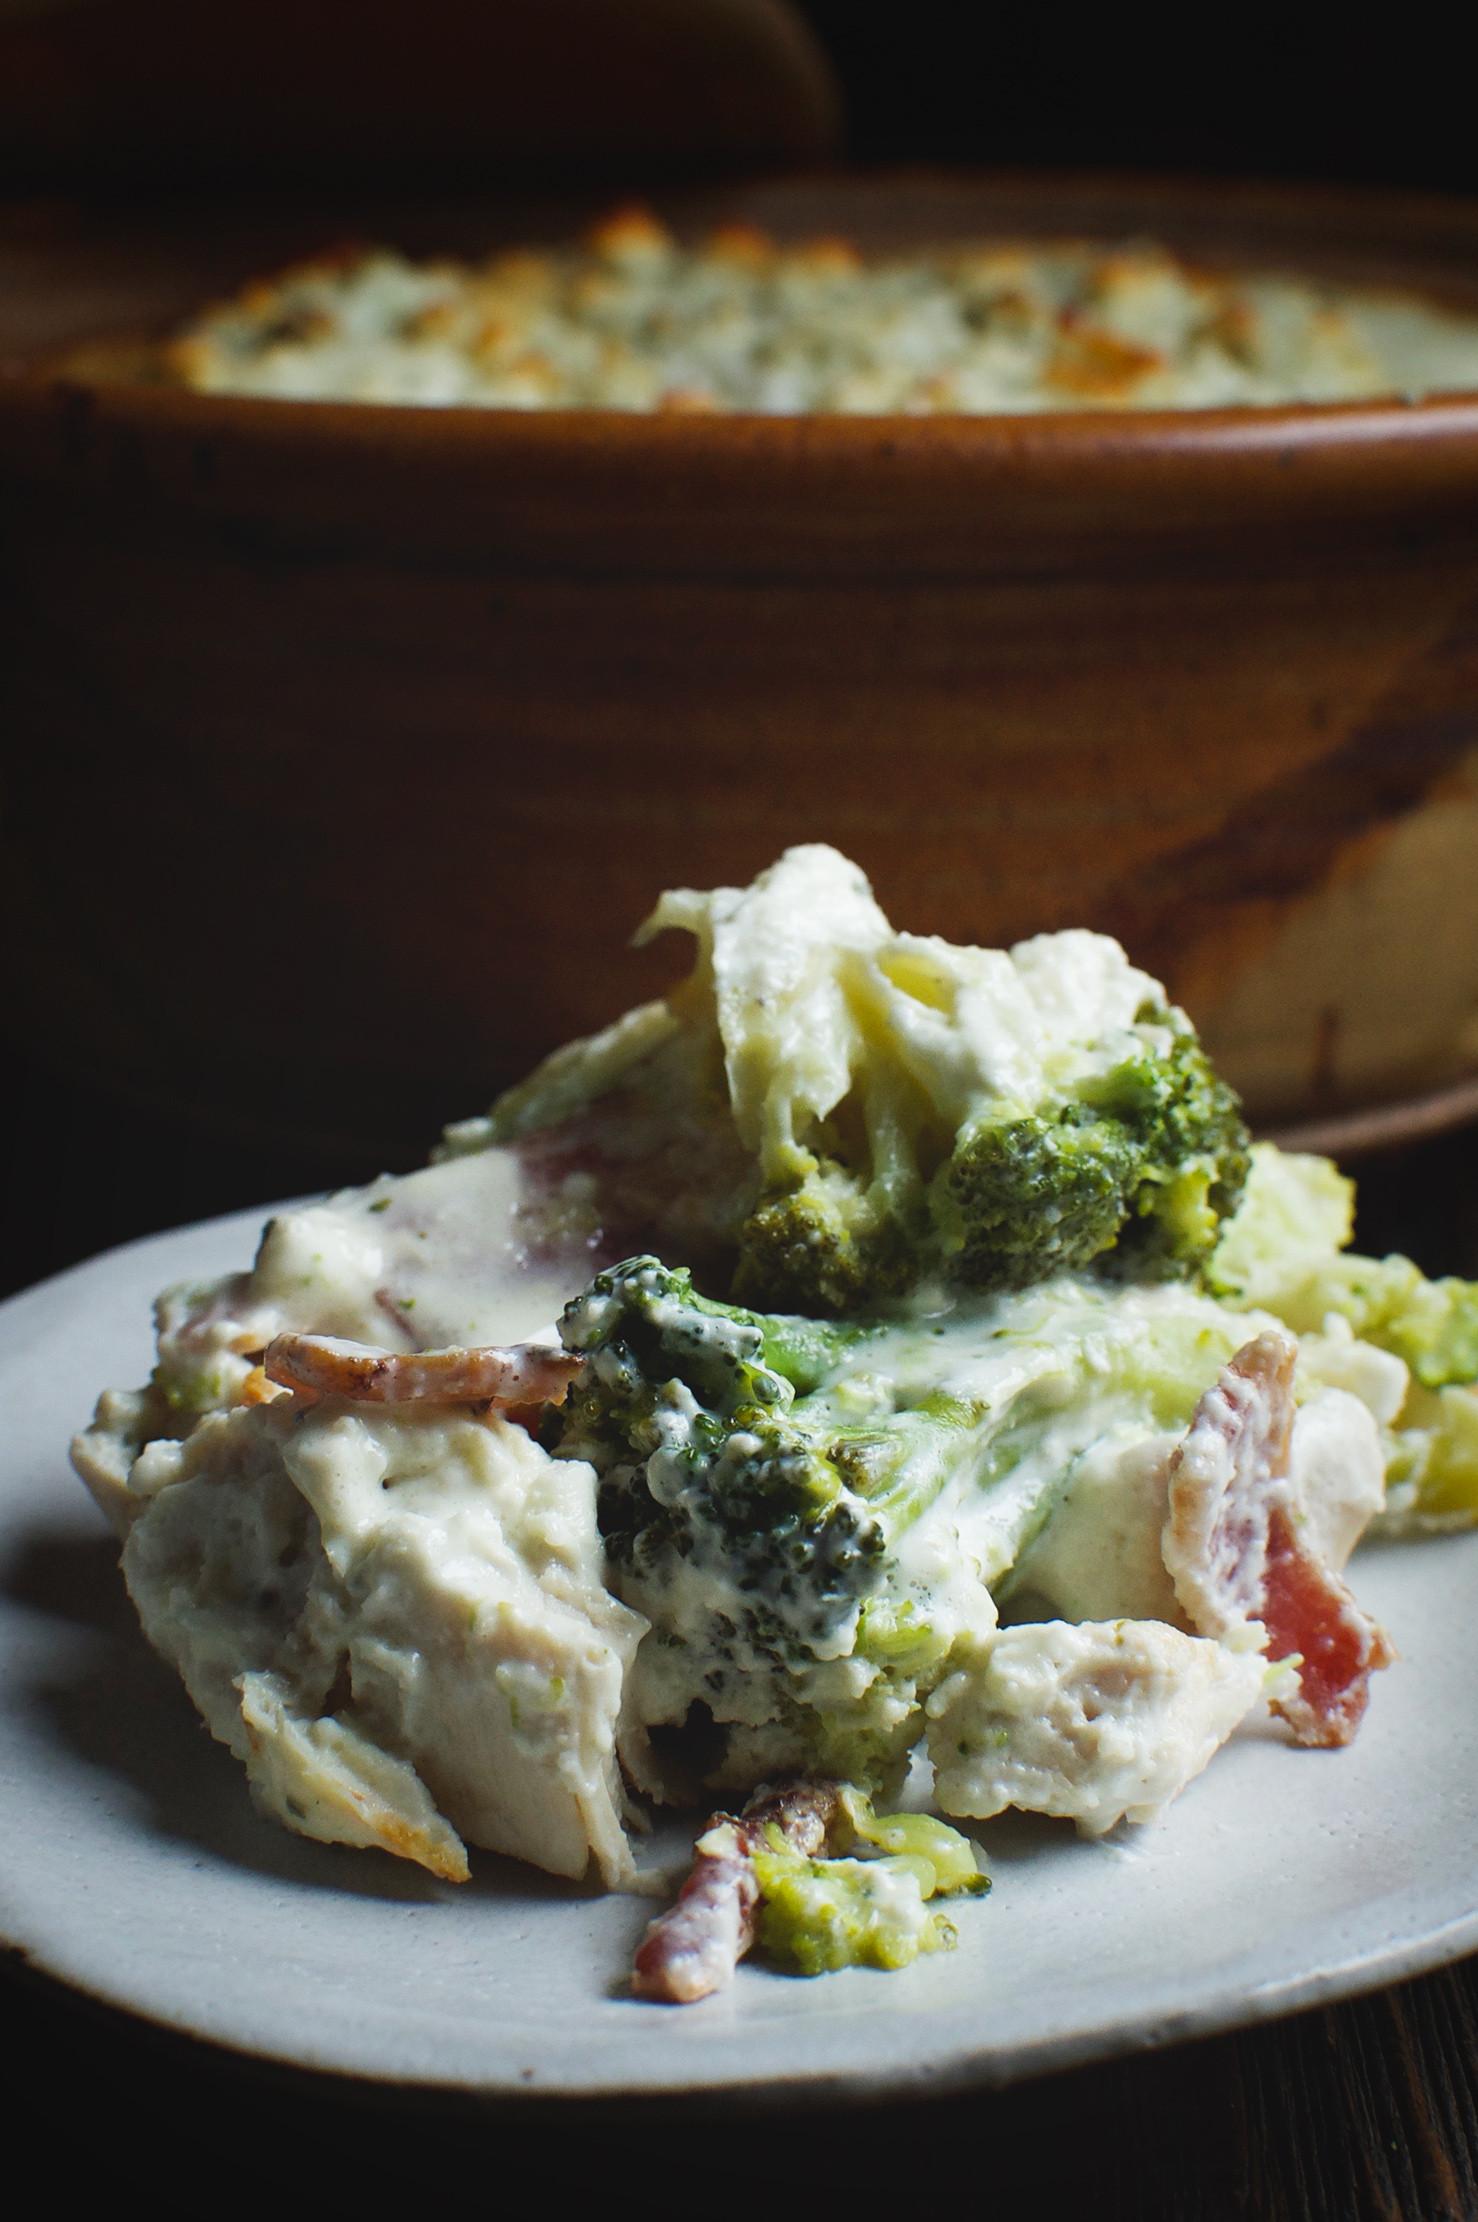 Healthy Turkey Casserole Recipes  Low Carb Leftover Turkey Casserole Recipe Simply So Healthy